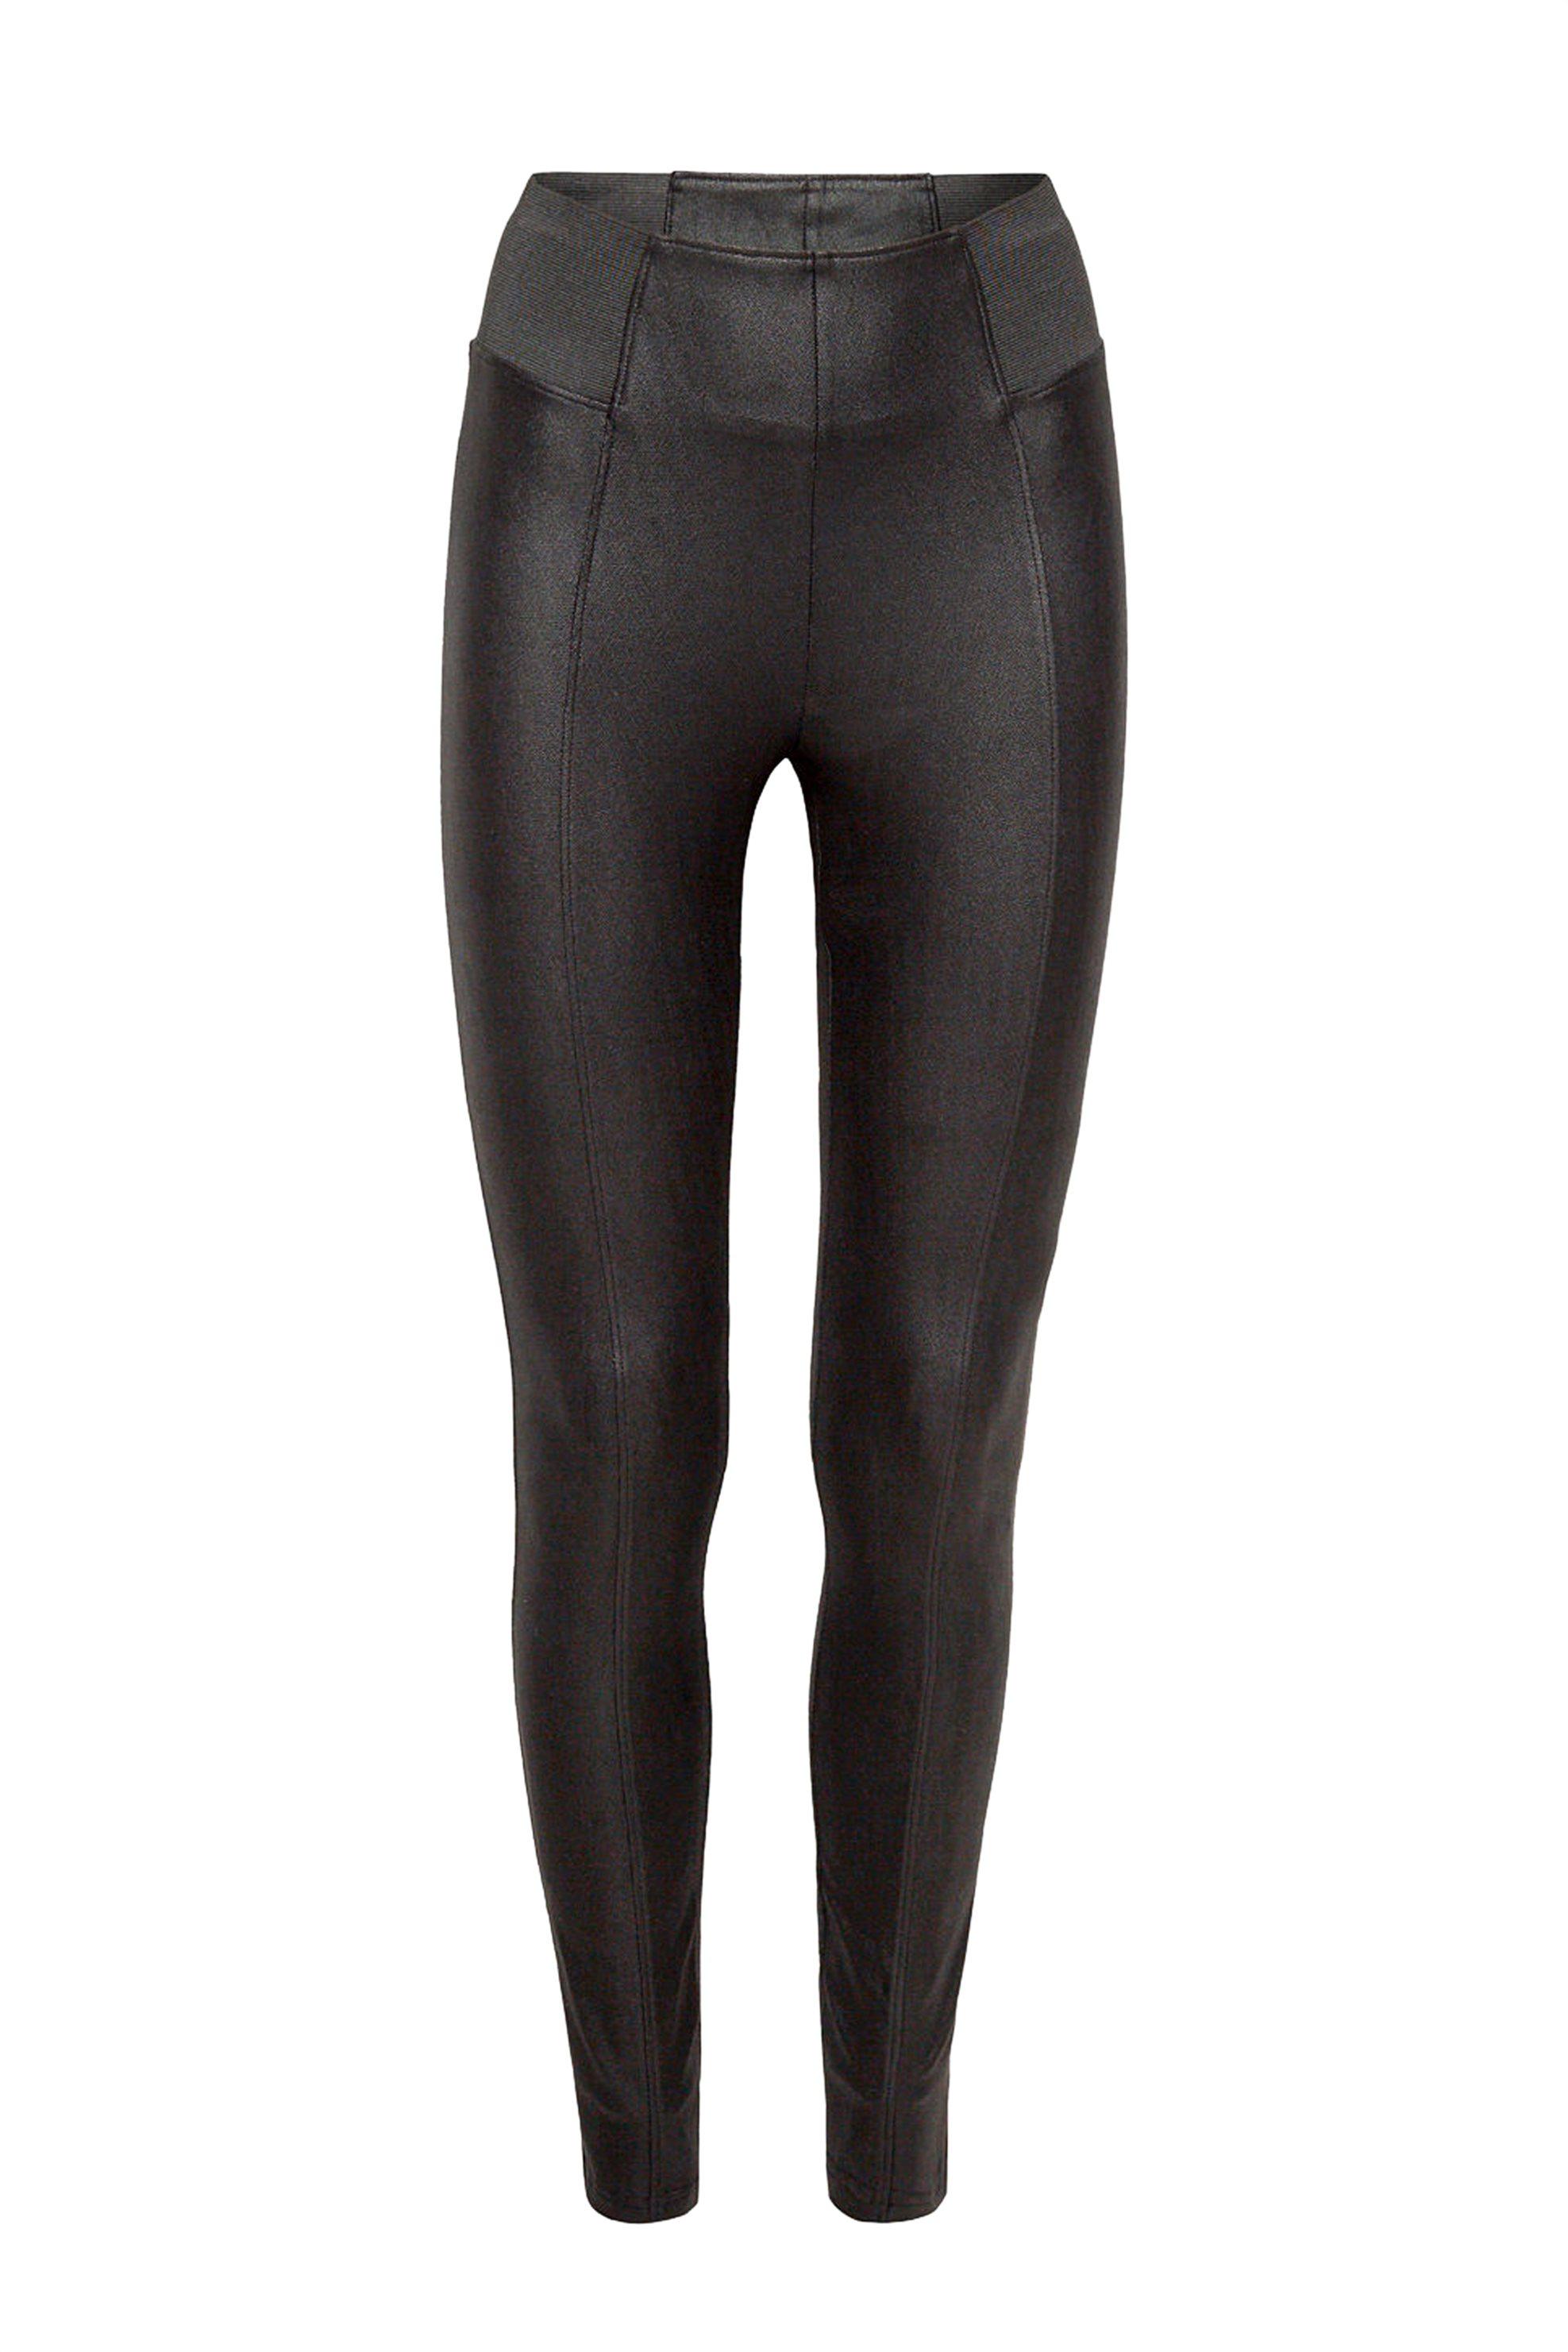 Esprit γυναικείο faux leather παντελόνι κολάν με λάστιχο στην μέση - 118EE1B043  γυναικα   ρουχα   παντελόνια   κολάν